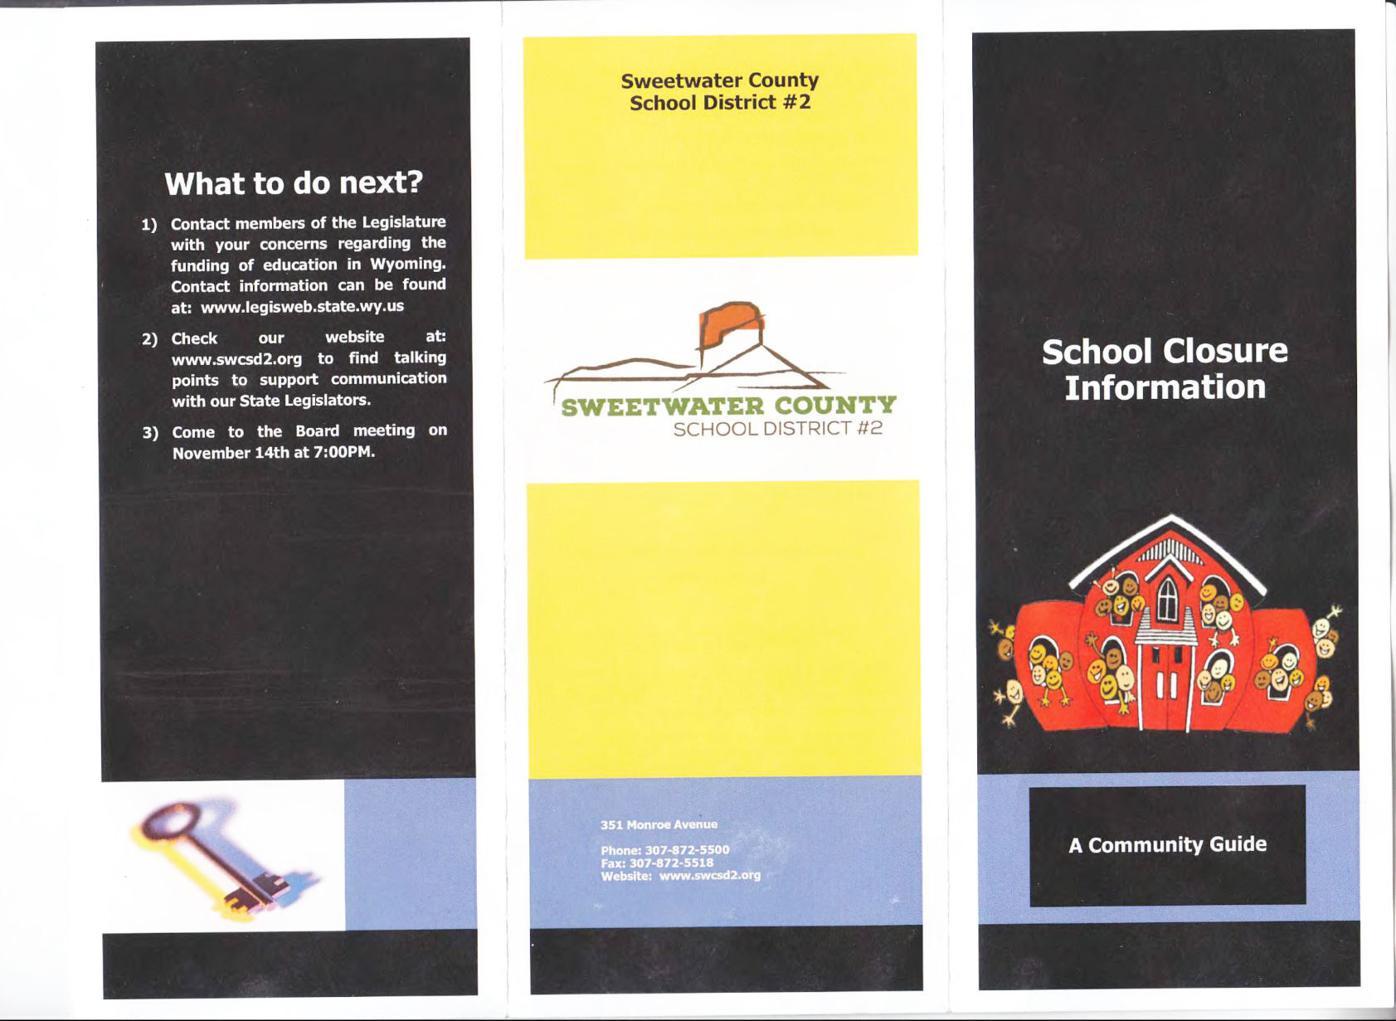 Flier details school closing plans ahead of board vote